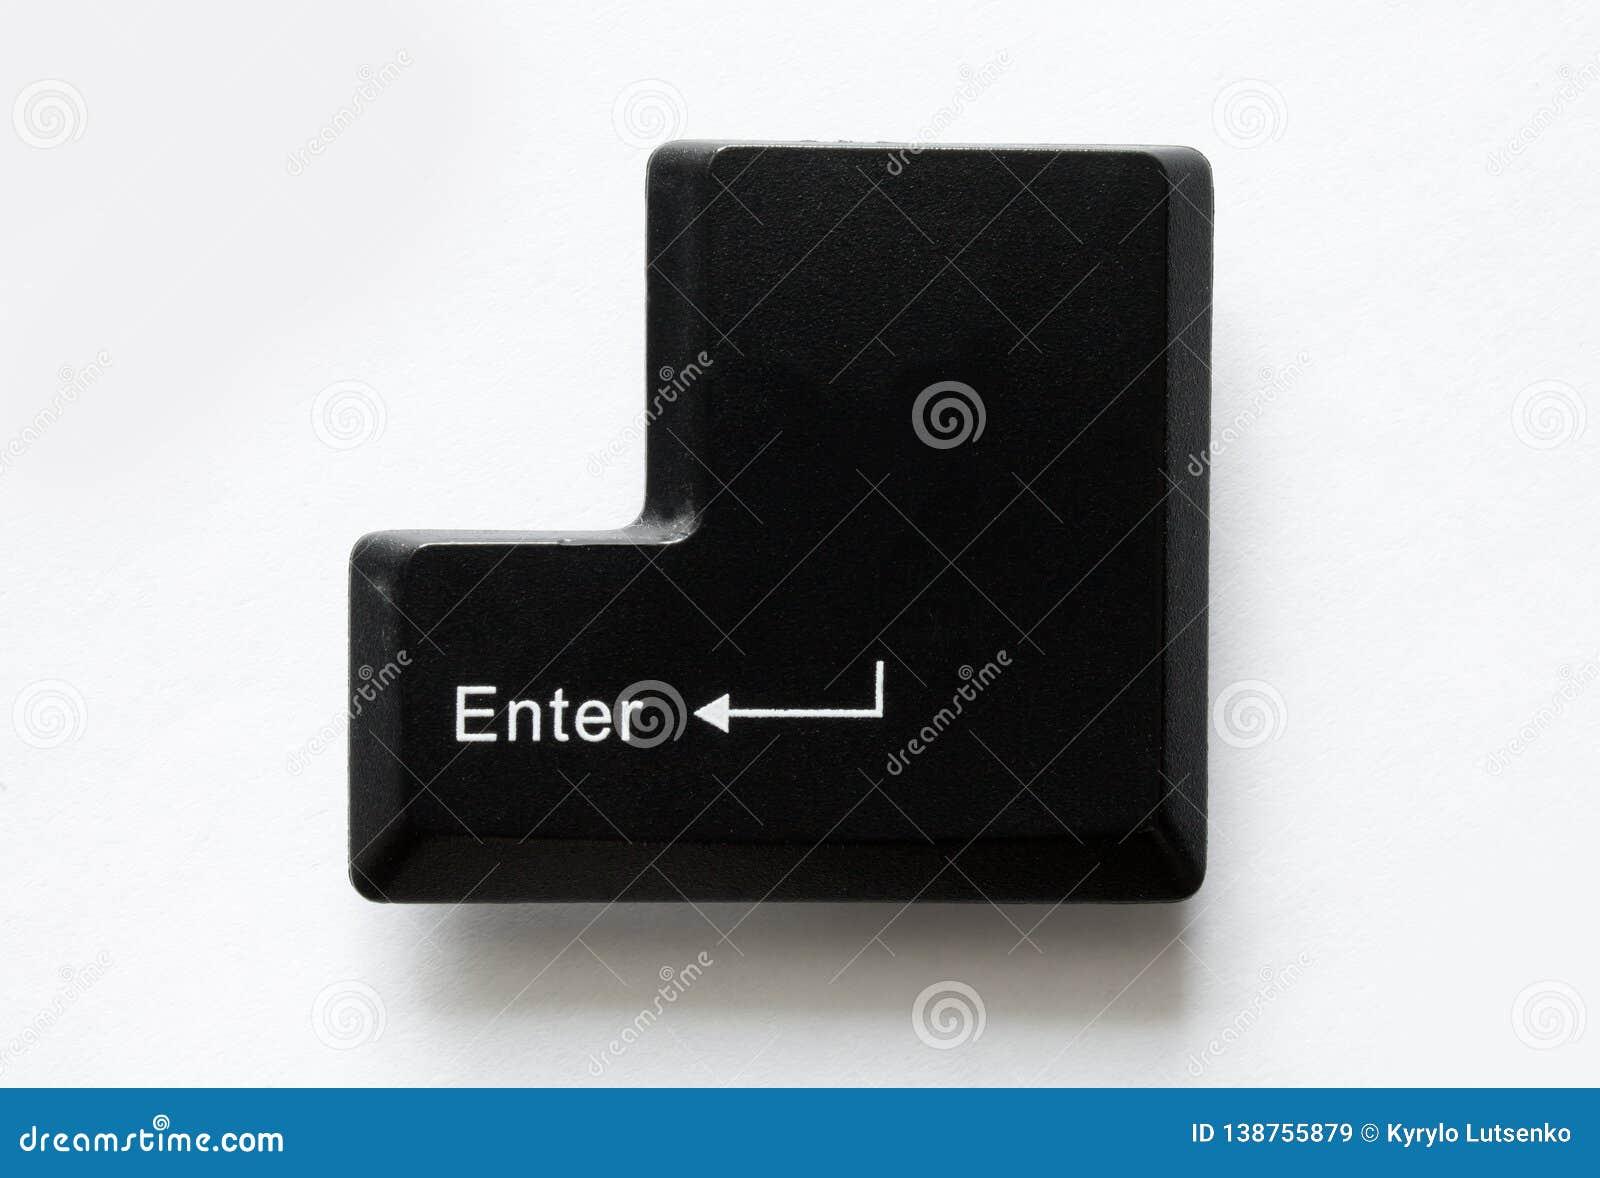 Computer-Taste enter